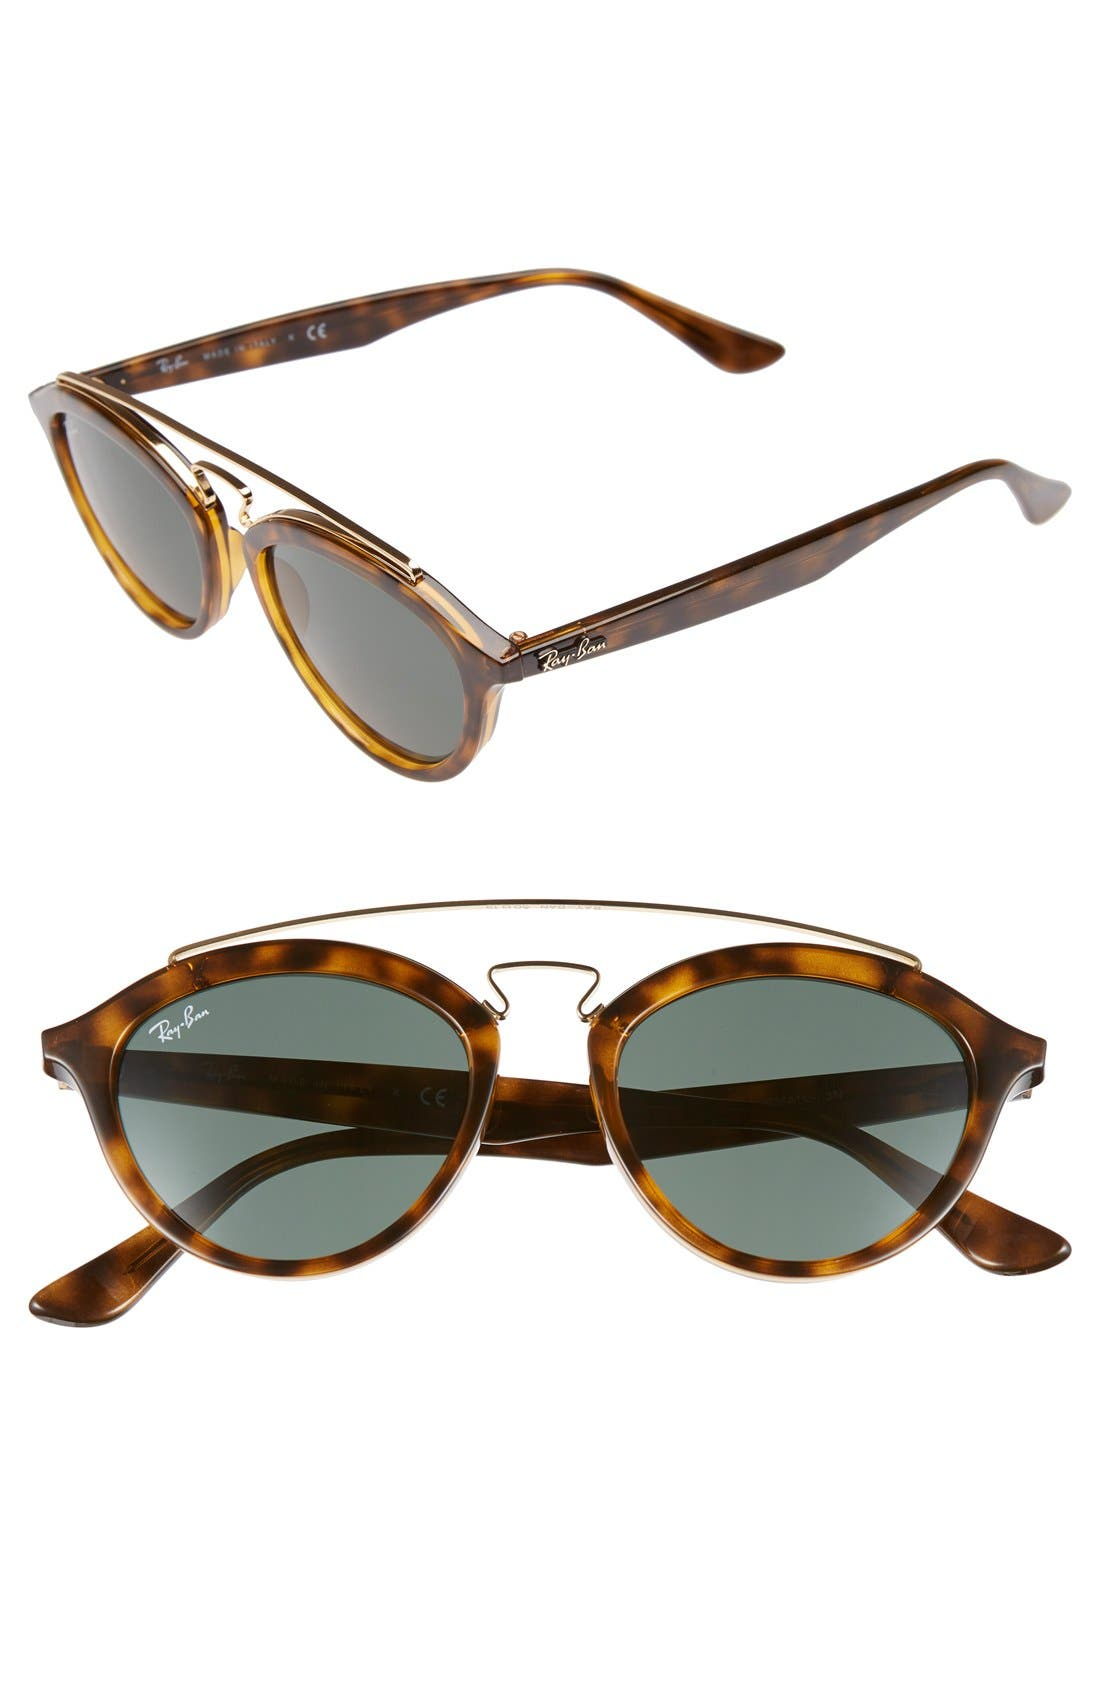 Highstreet 50mm Brow Bar Sunglasses,                         Main,                         color, Havana